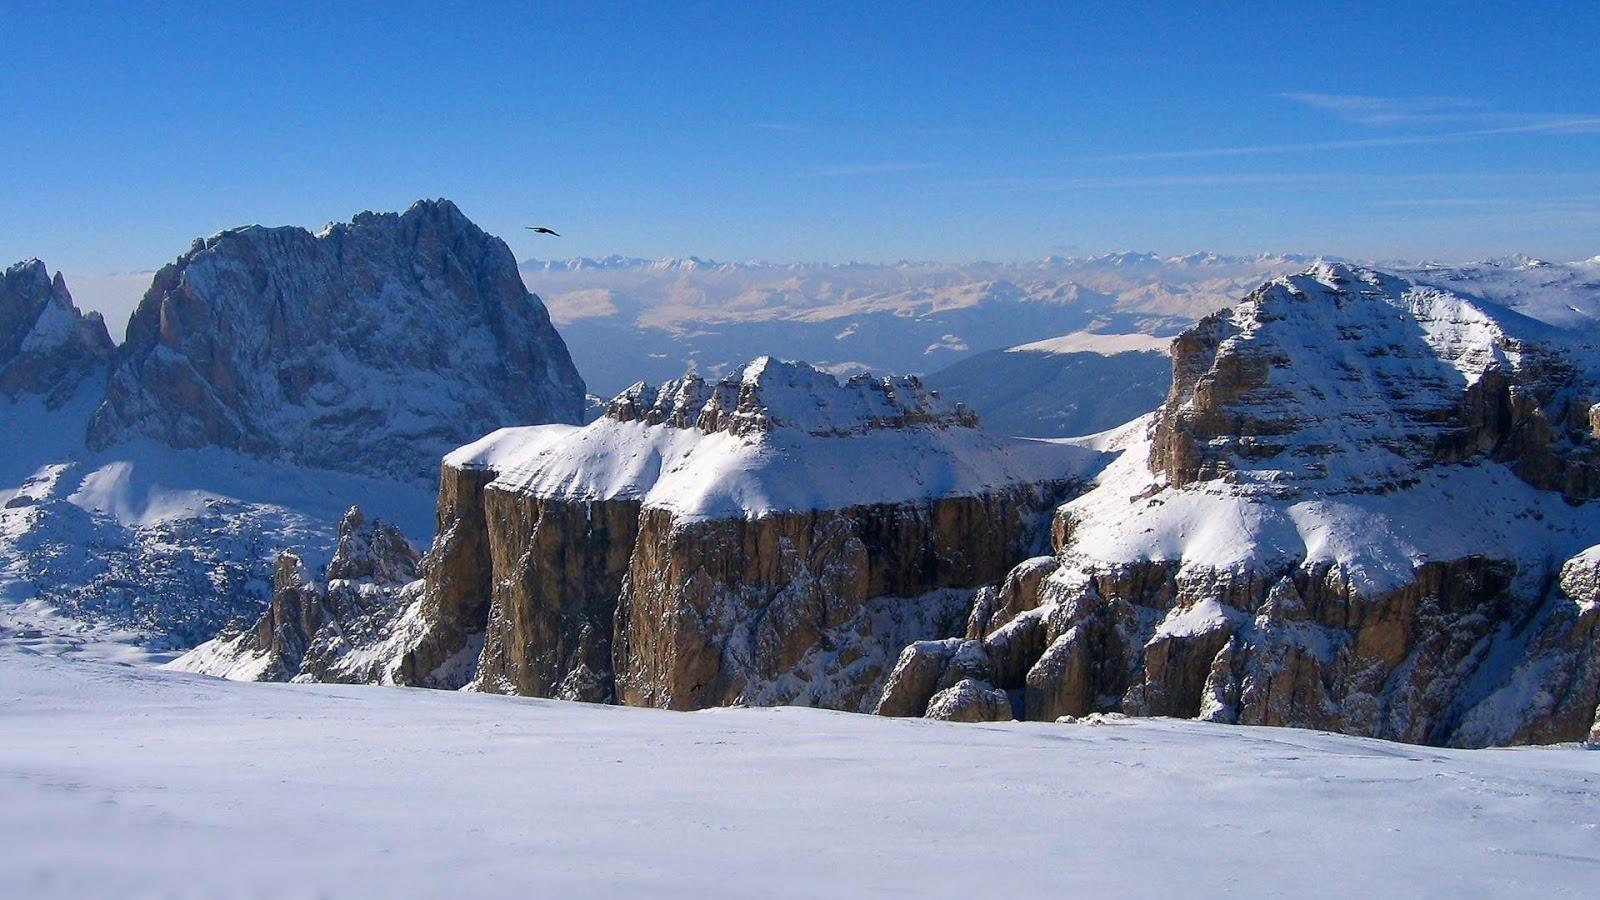 Fondo De Pantalla Paisaje Montañas Nevada: Fondo De Pantalla Paisajes Montañas Llenas De Nieve